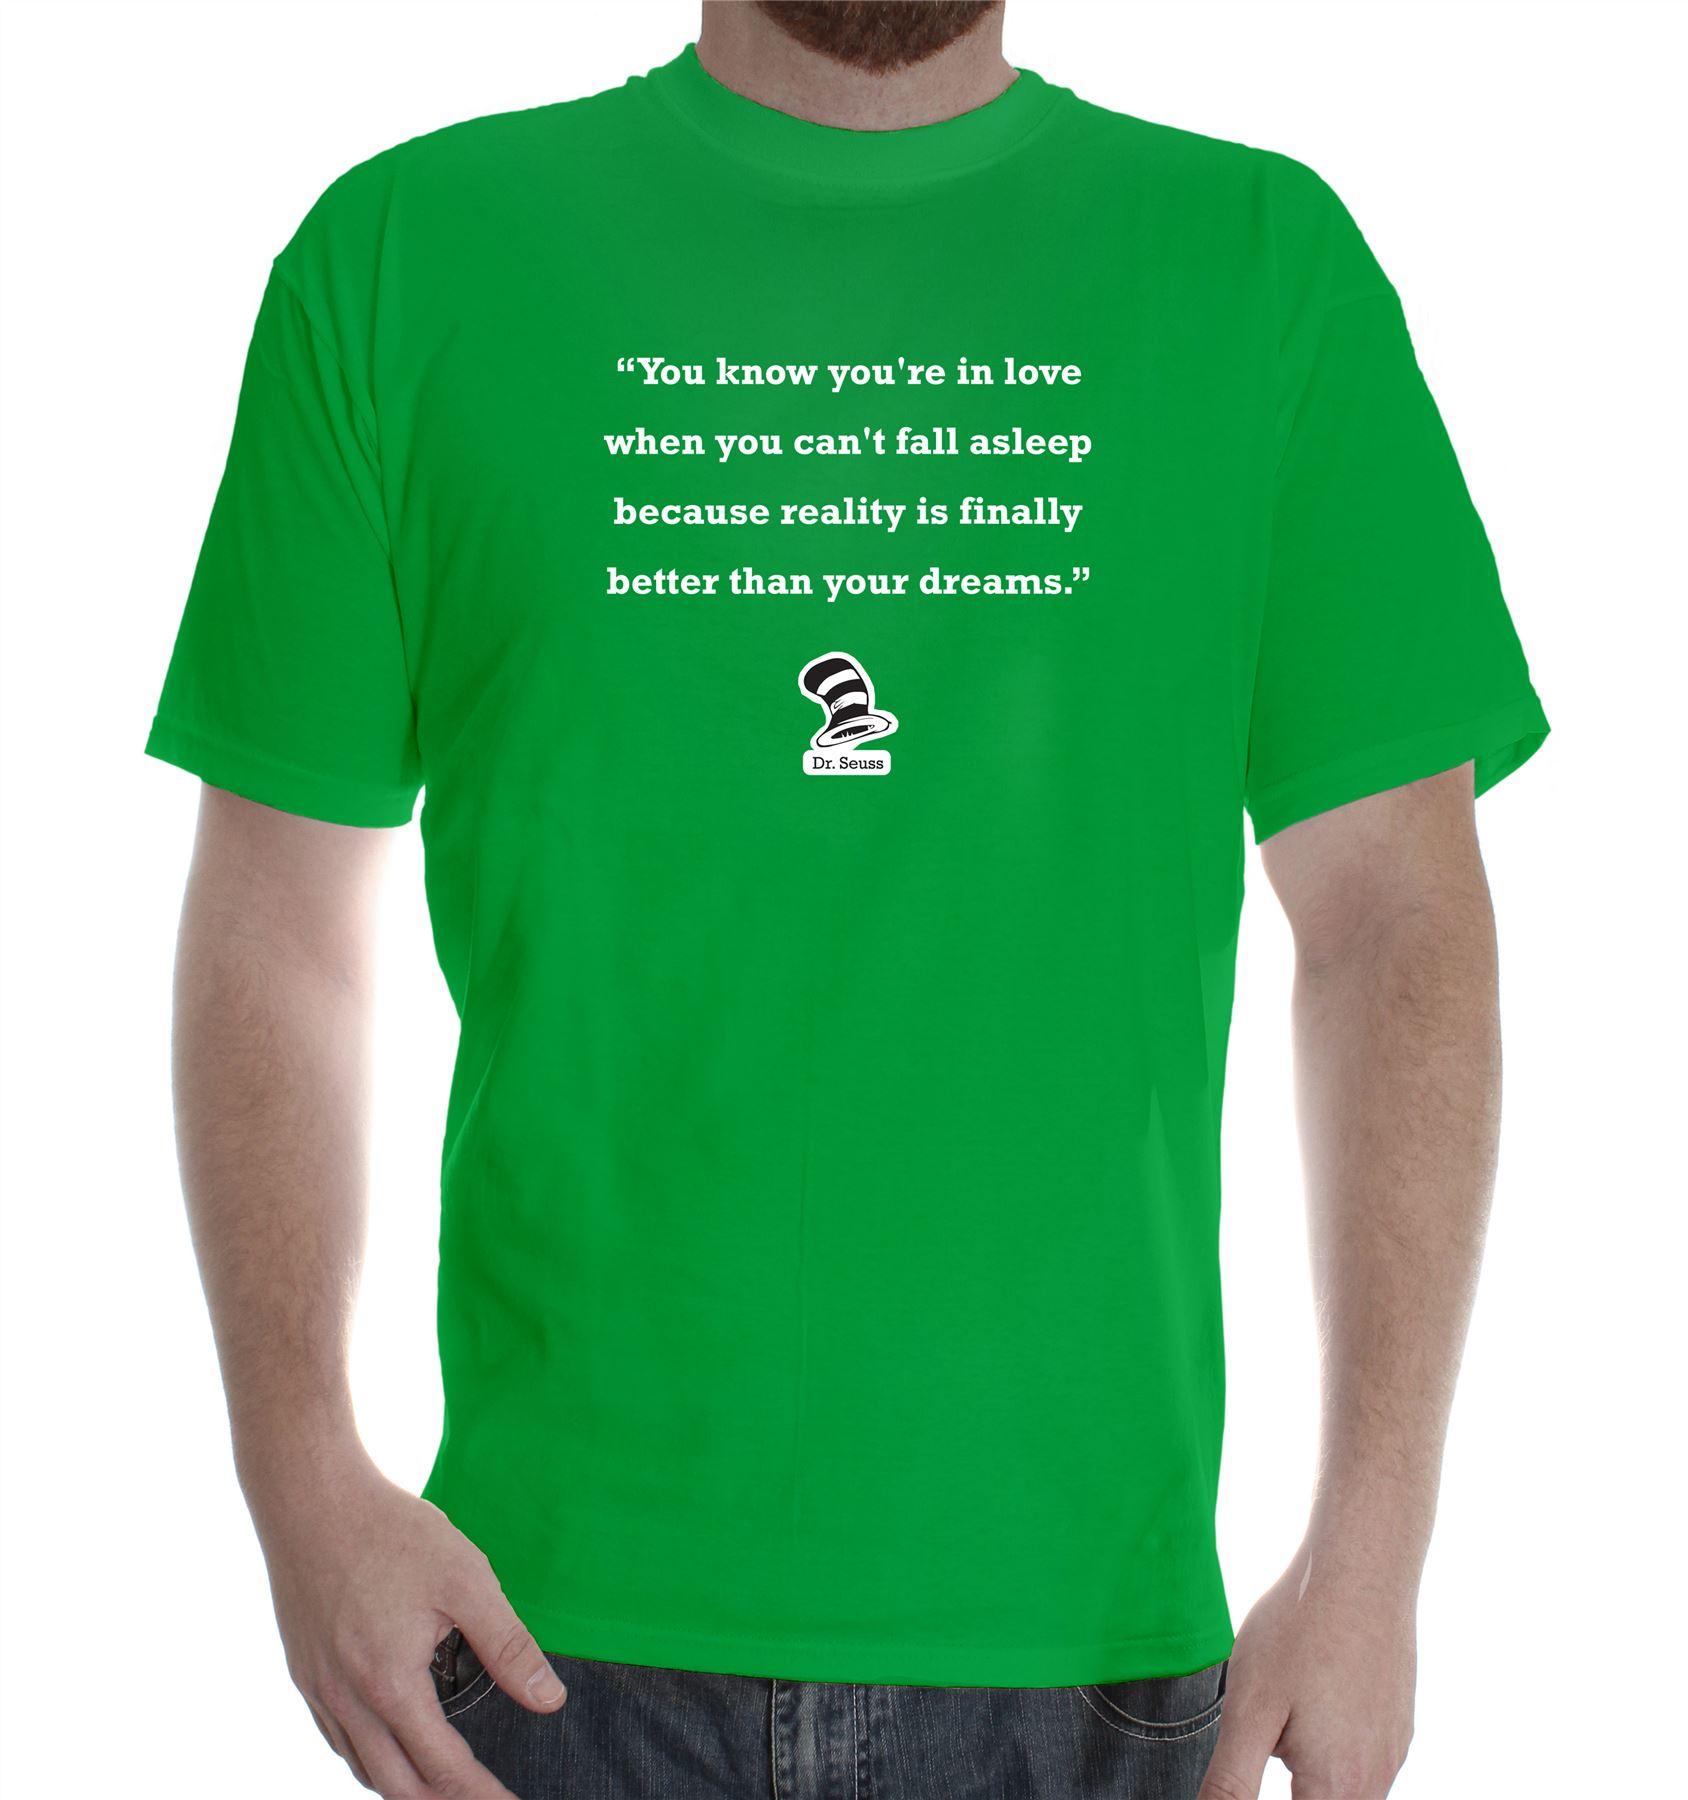 Shirt design new - Mens Printed Cotton T Shirt Tee Shirt Design